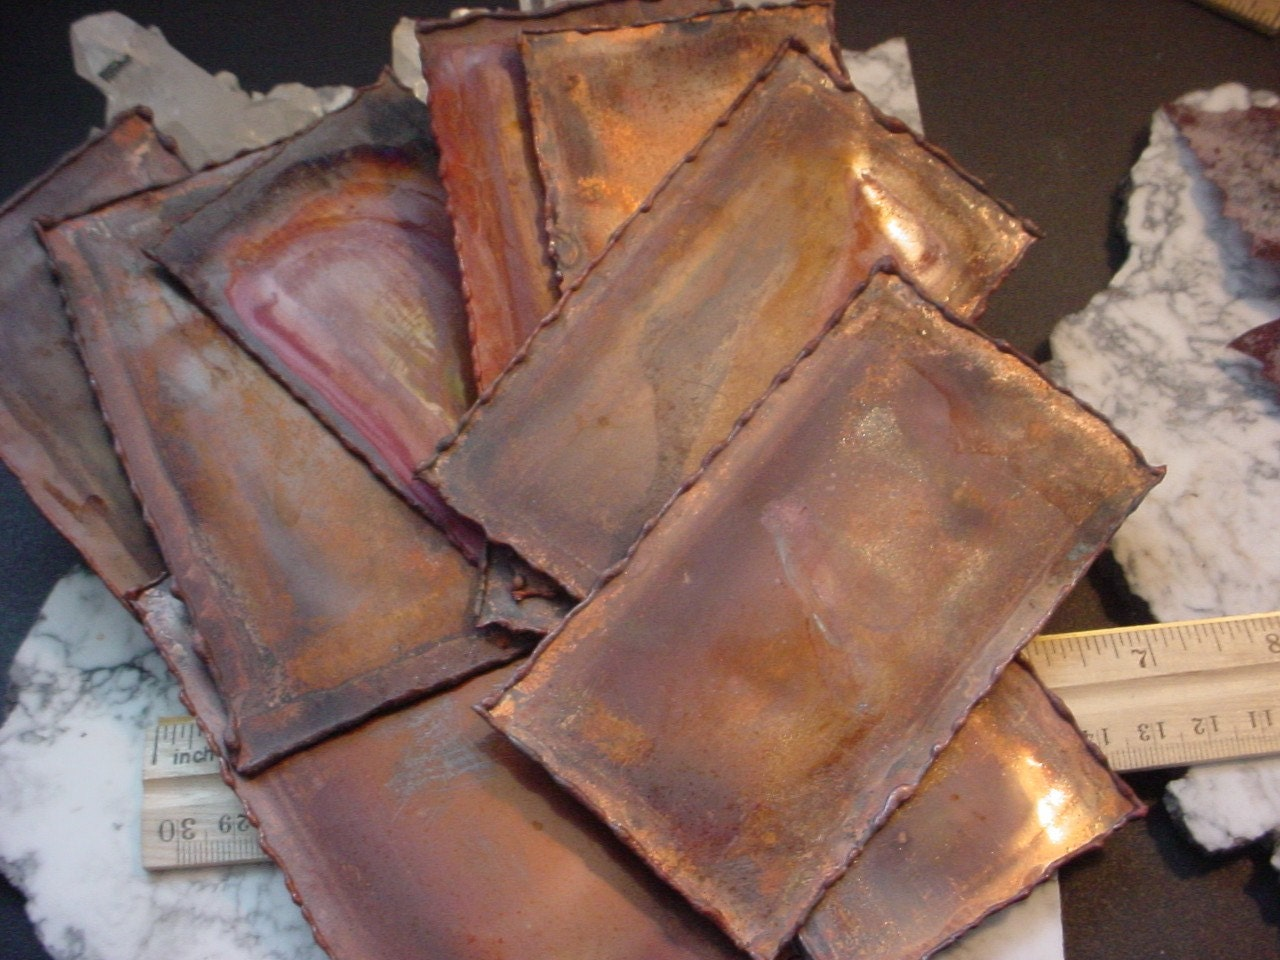 2pc Anodized Aged Copper Sheet Metal 22g Molten Edges